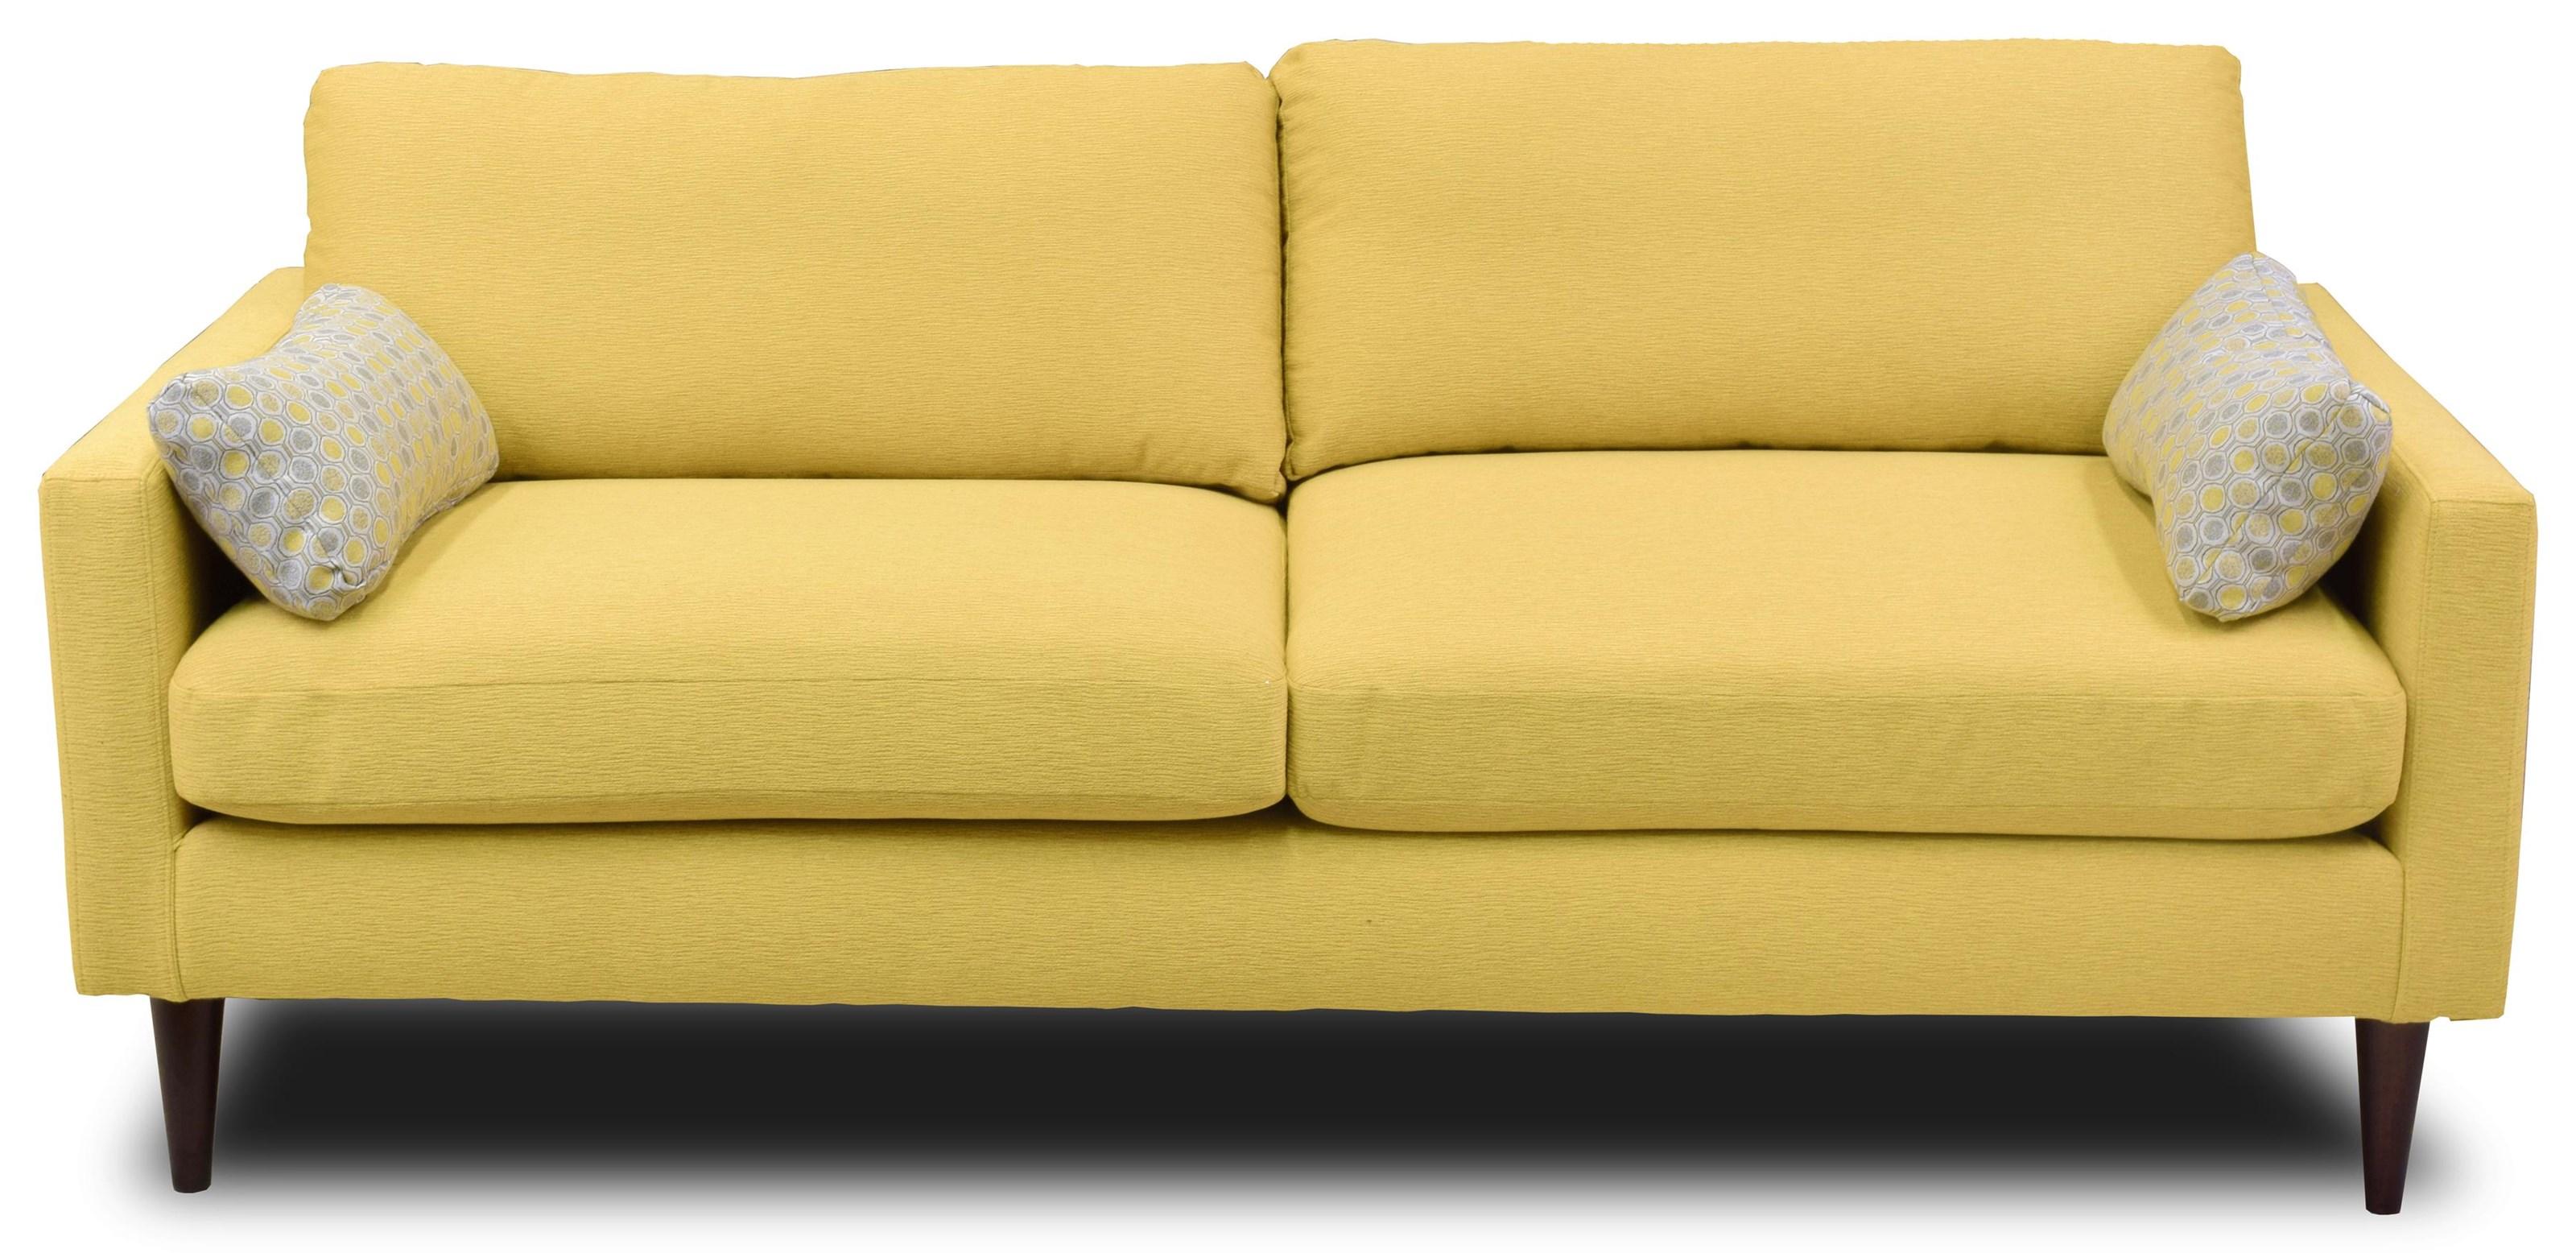 Trafton Sofa at Ruby Gordon Home